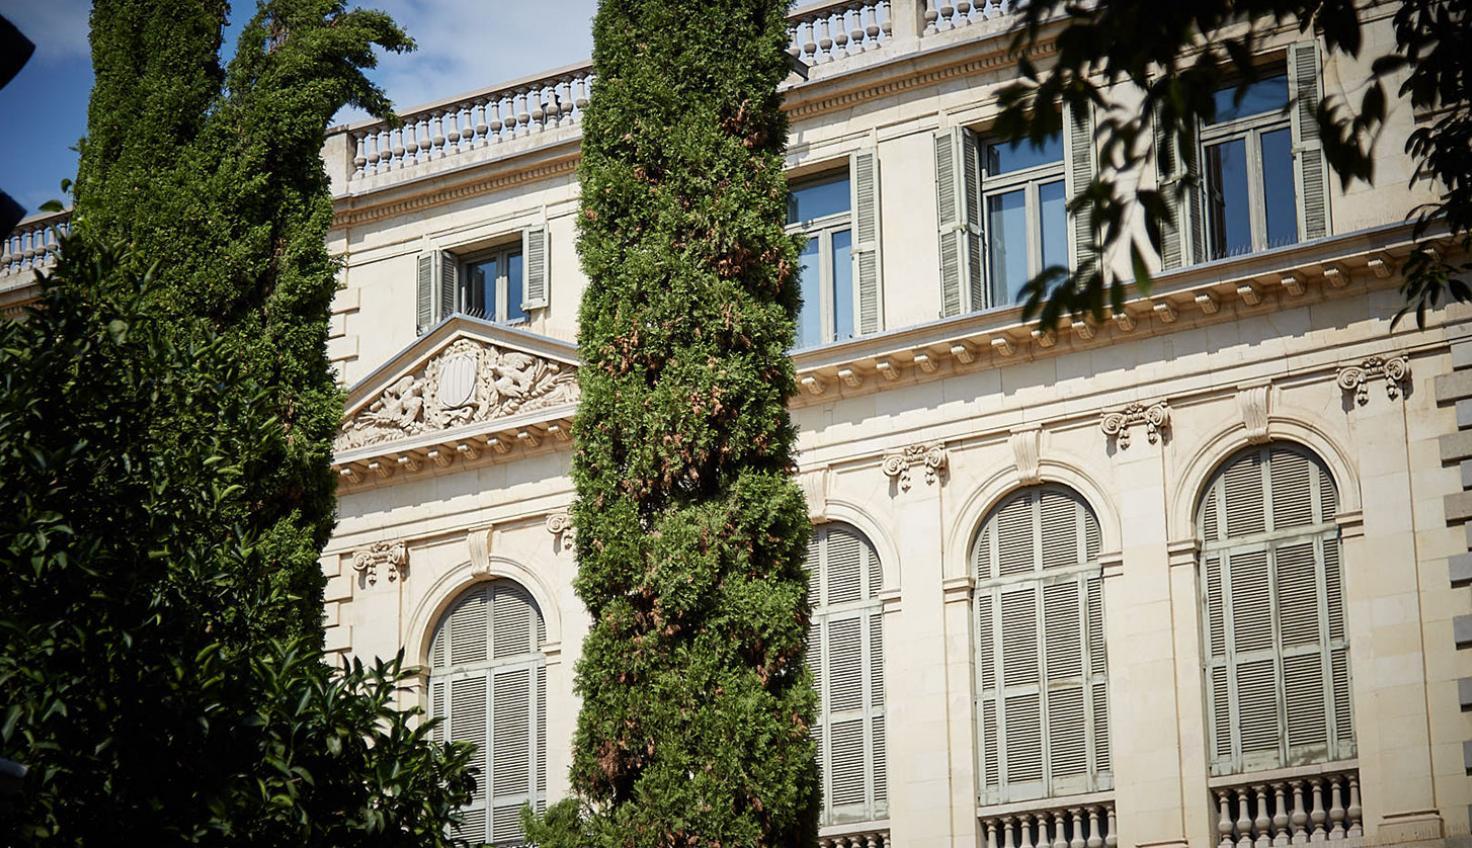 Foto Palazzo Robert